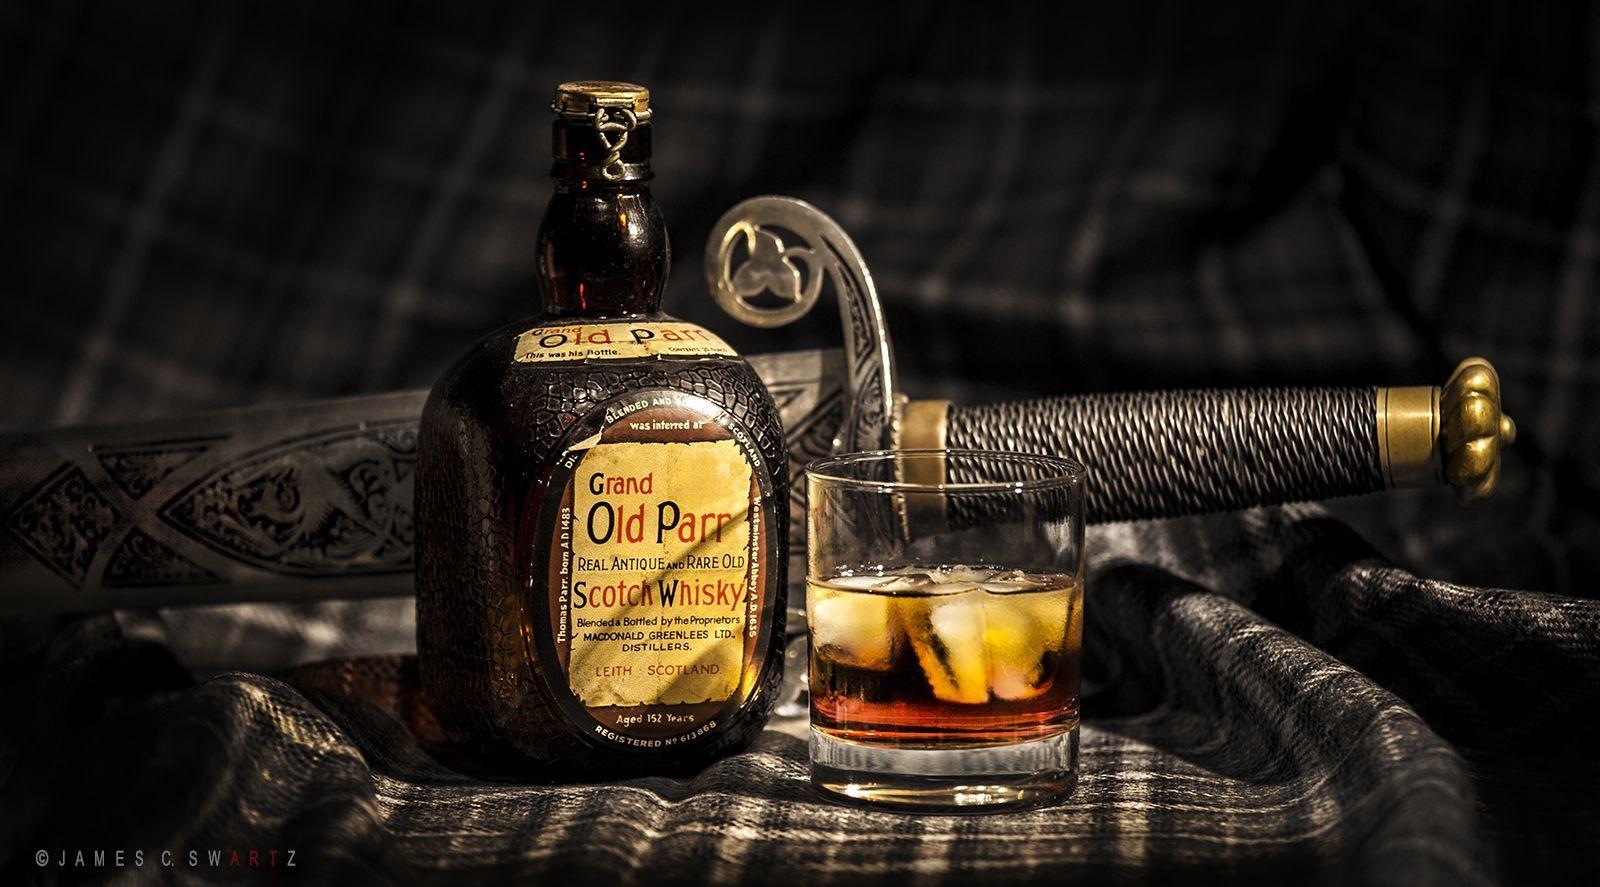 Old Parr老帕爾威士忌